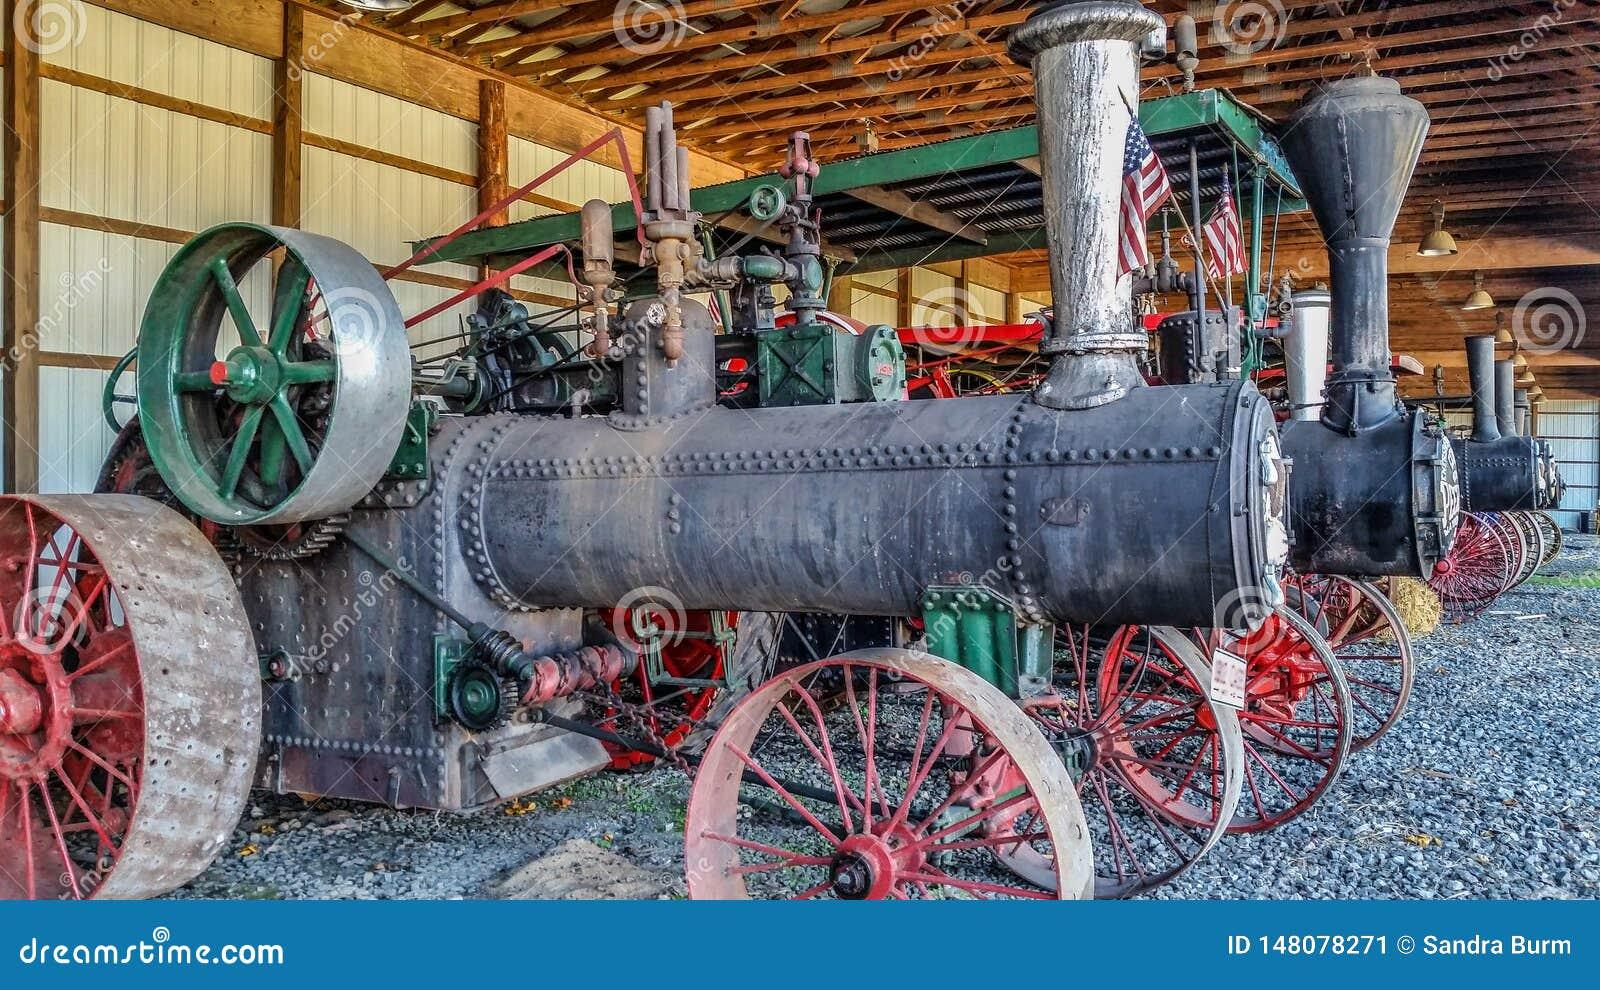 Steam threshers on display